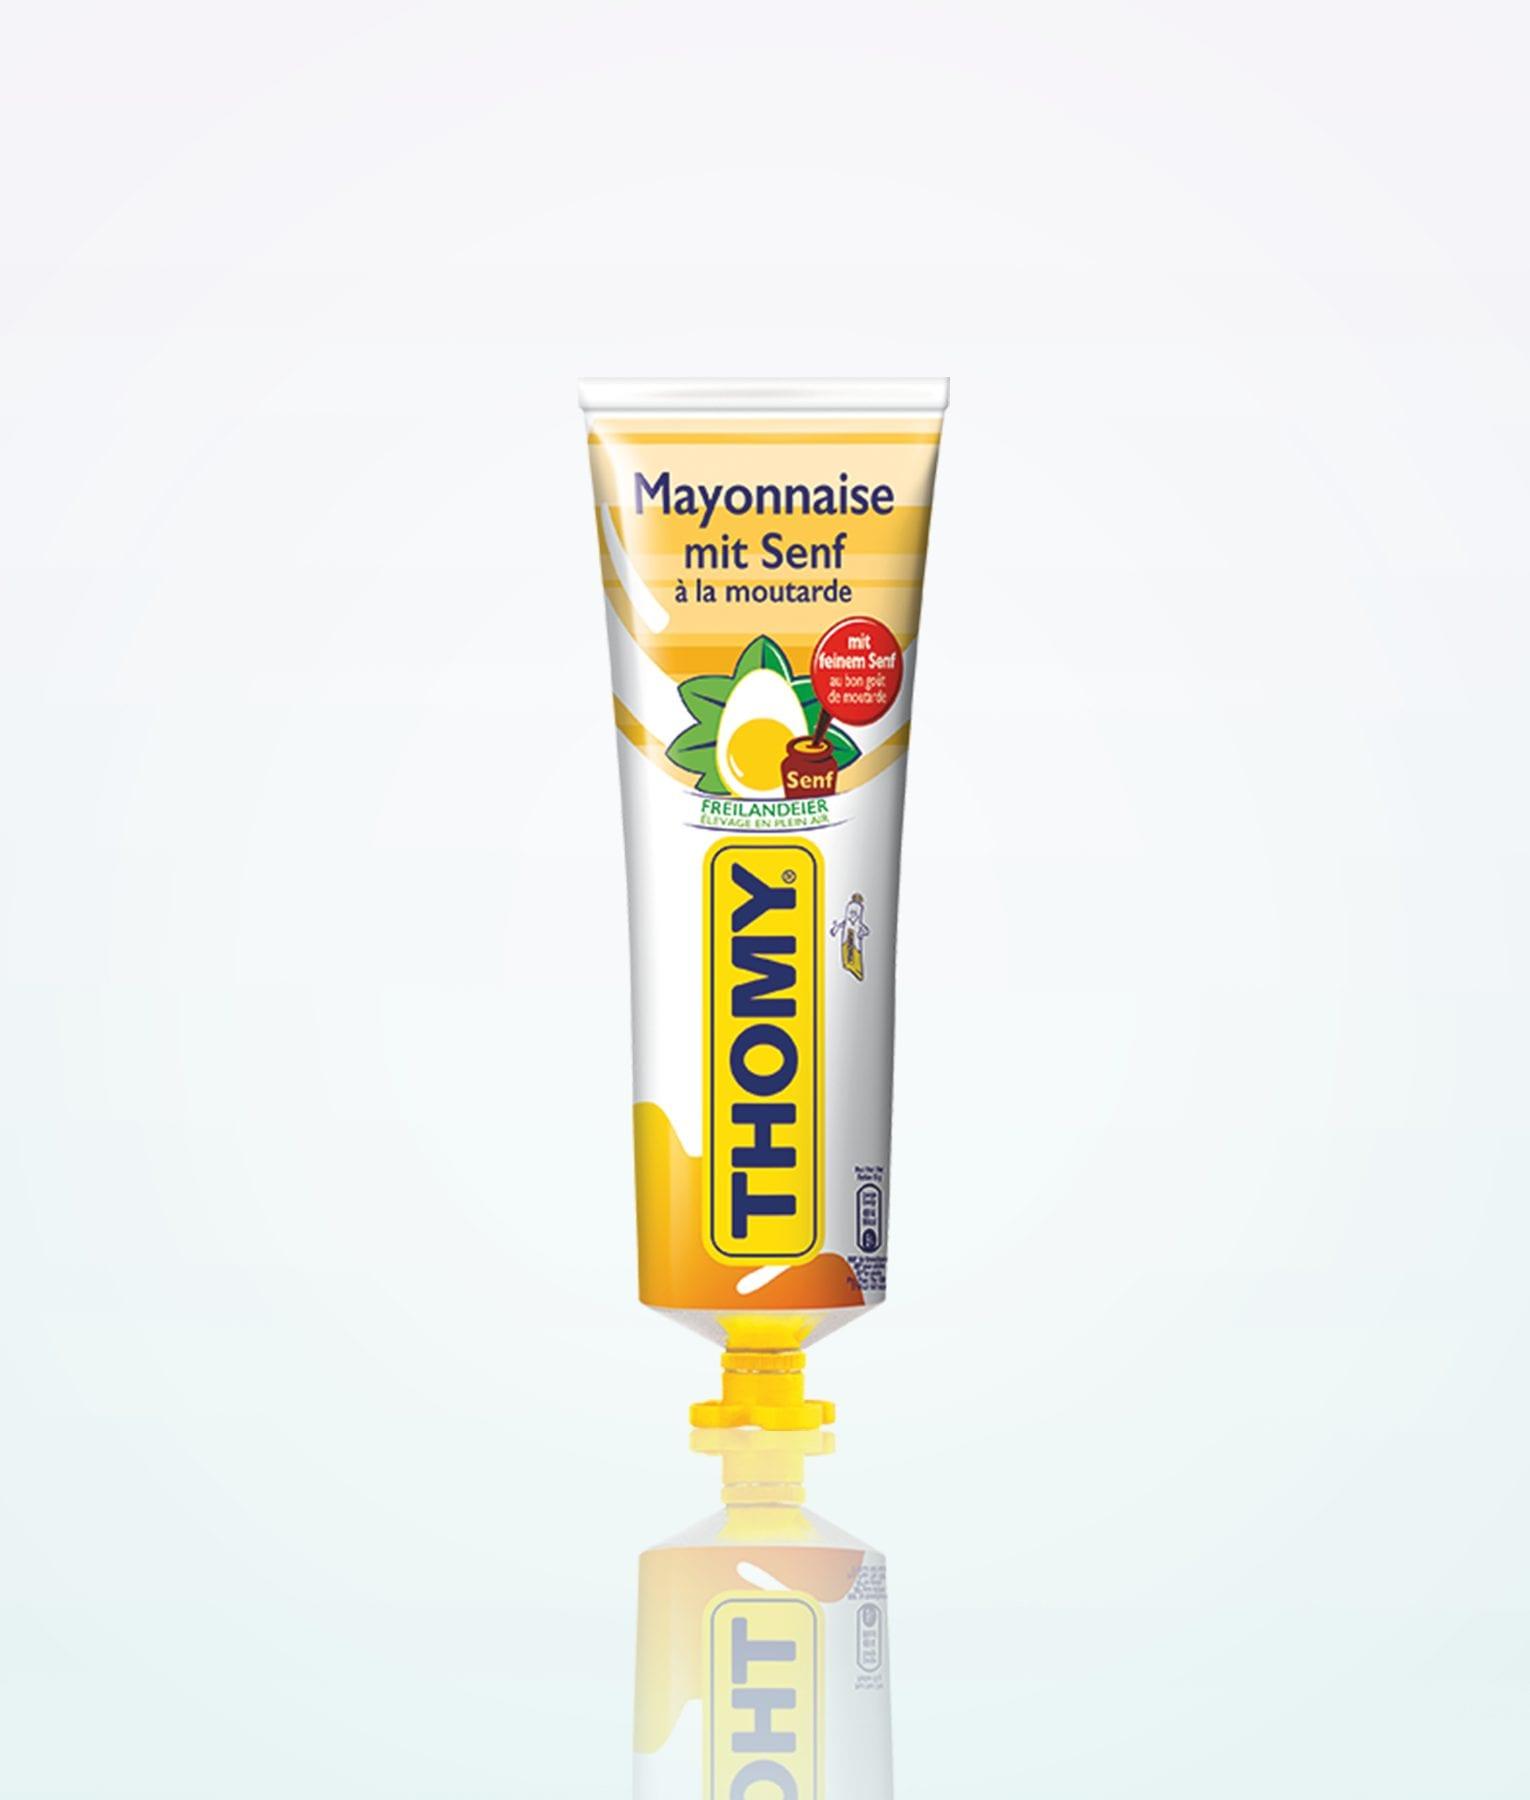 thomy-mayonnainse-with-senf